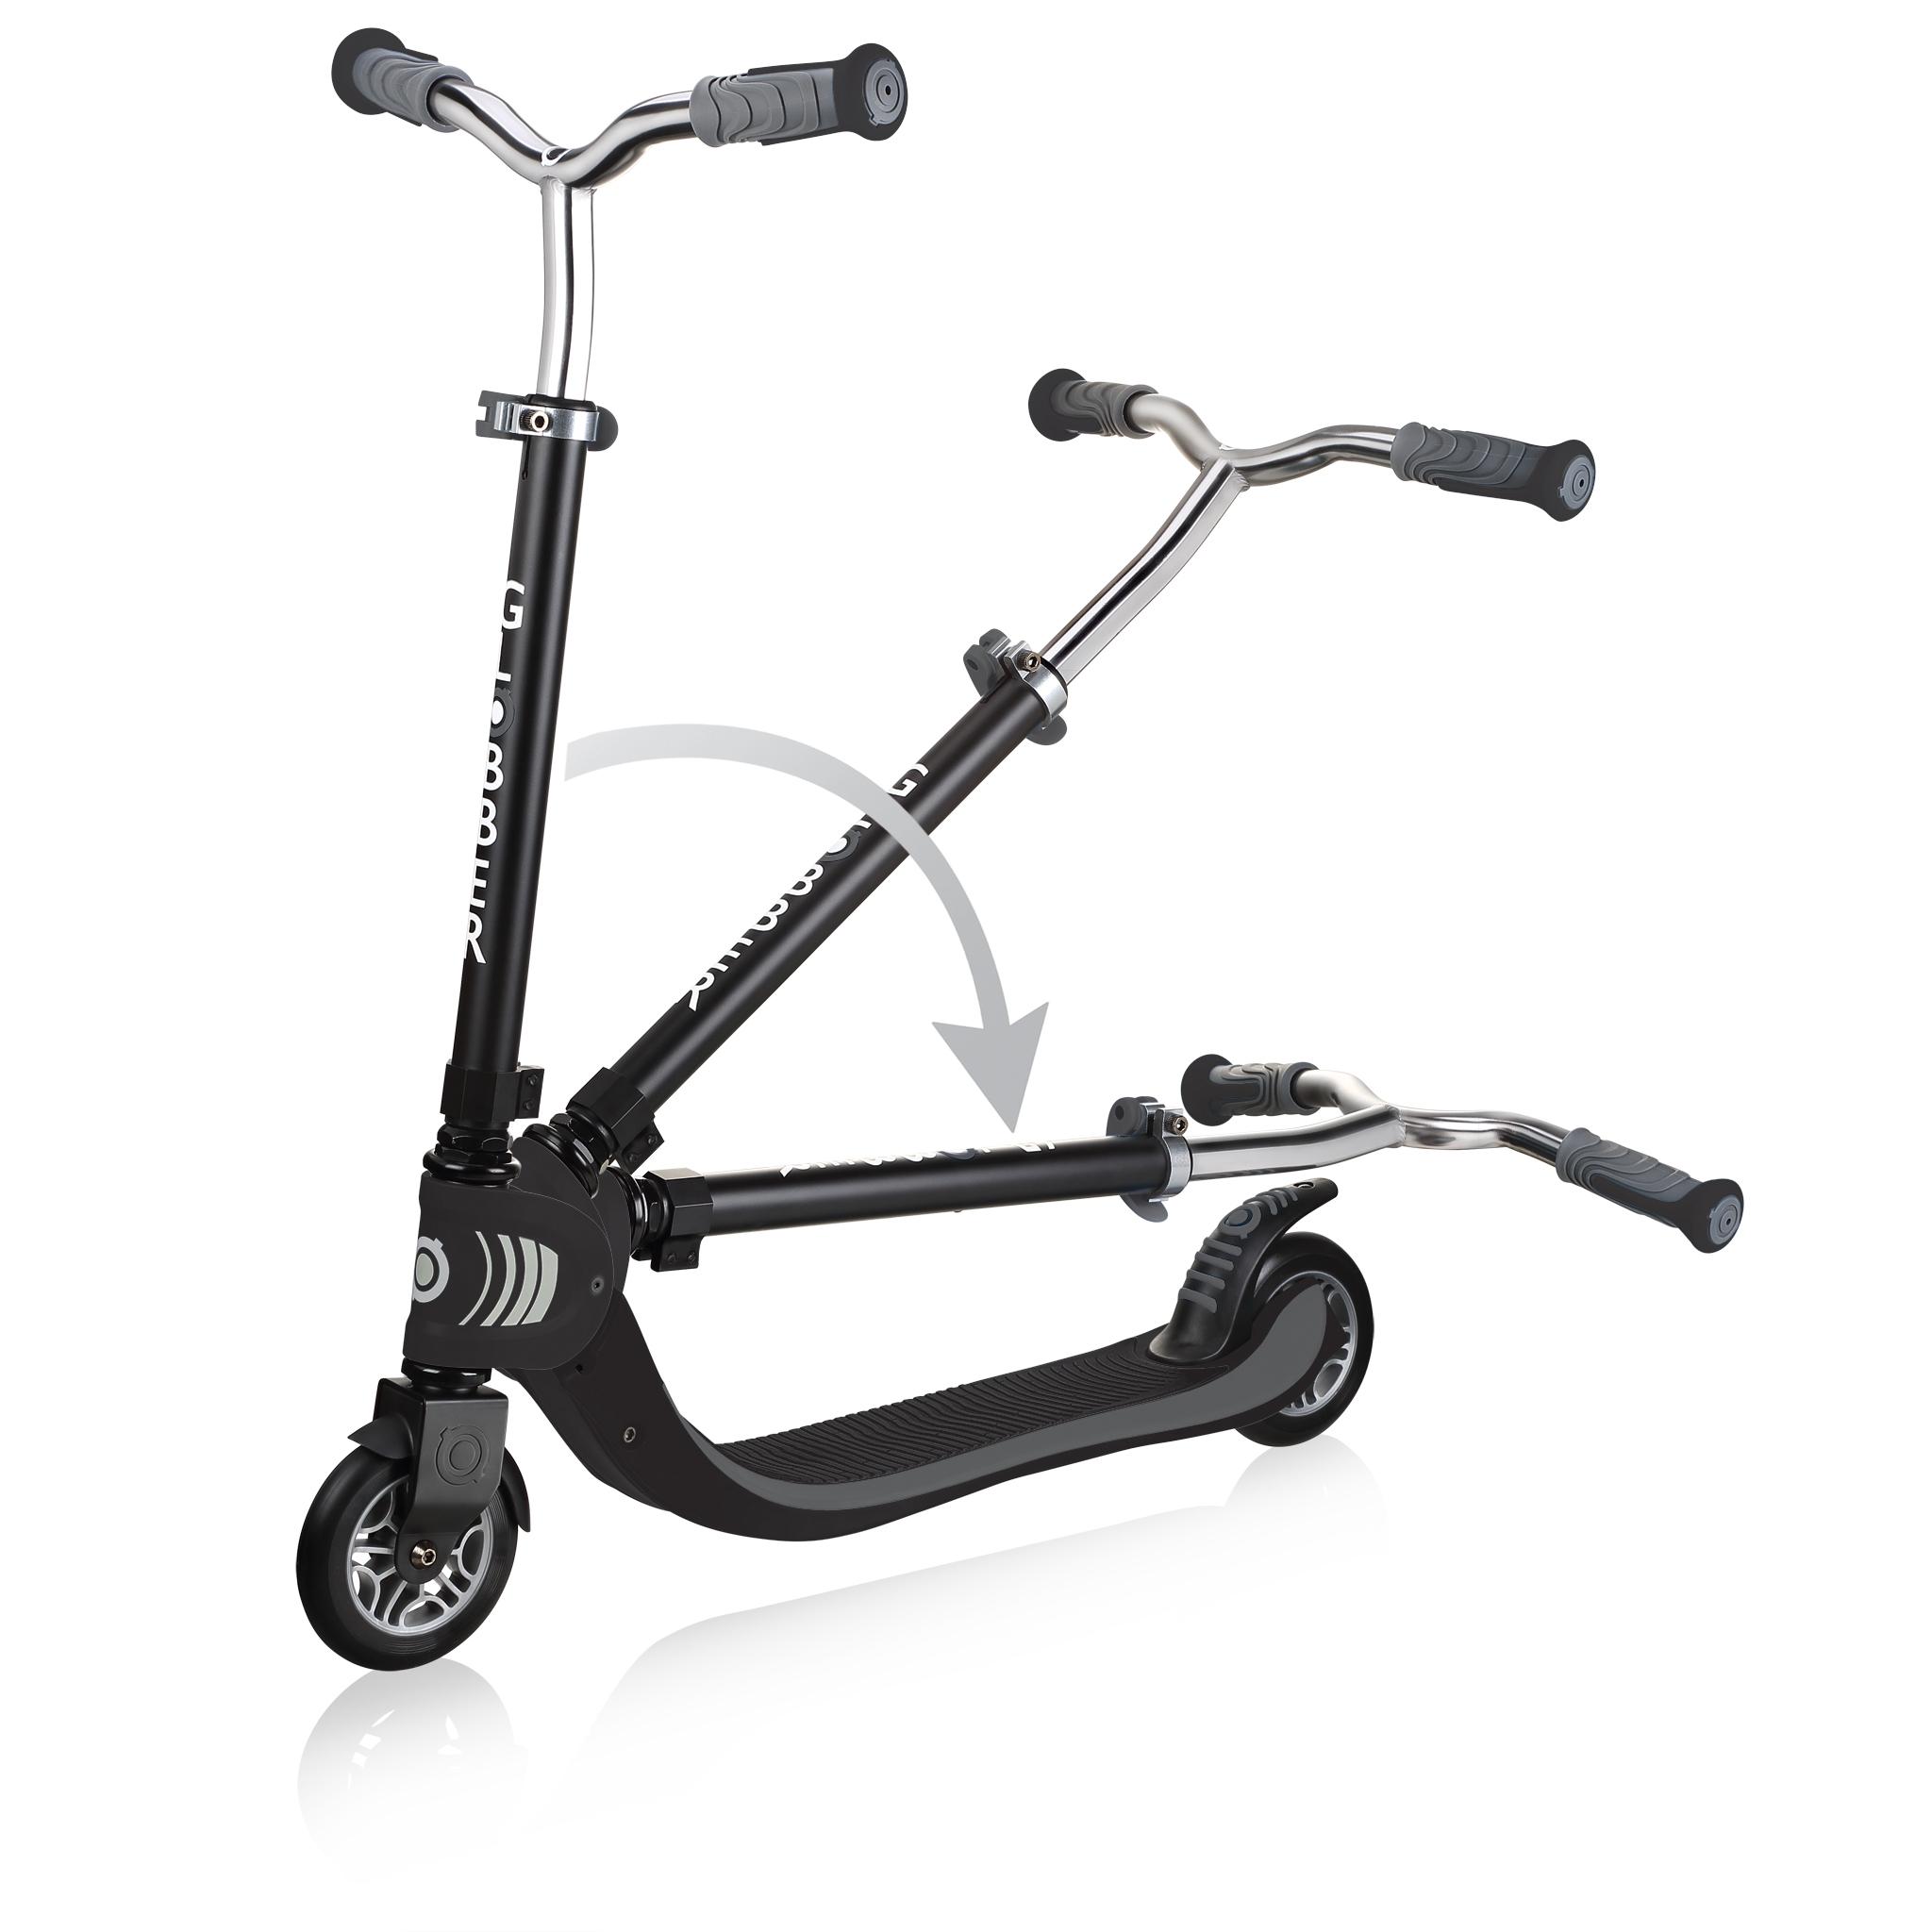 FLOW-FOLDABLE-125-2-wheel-folding-scooter-for-kids-black 2